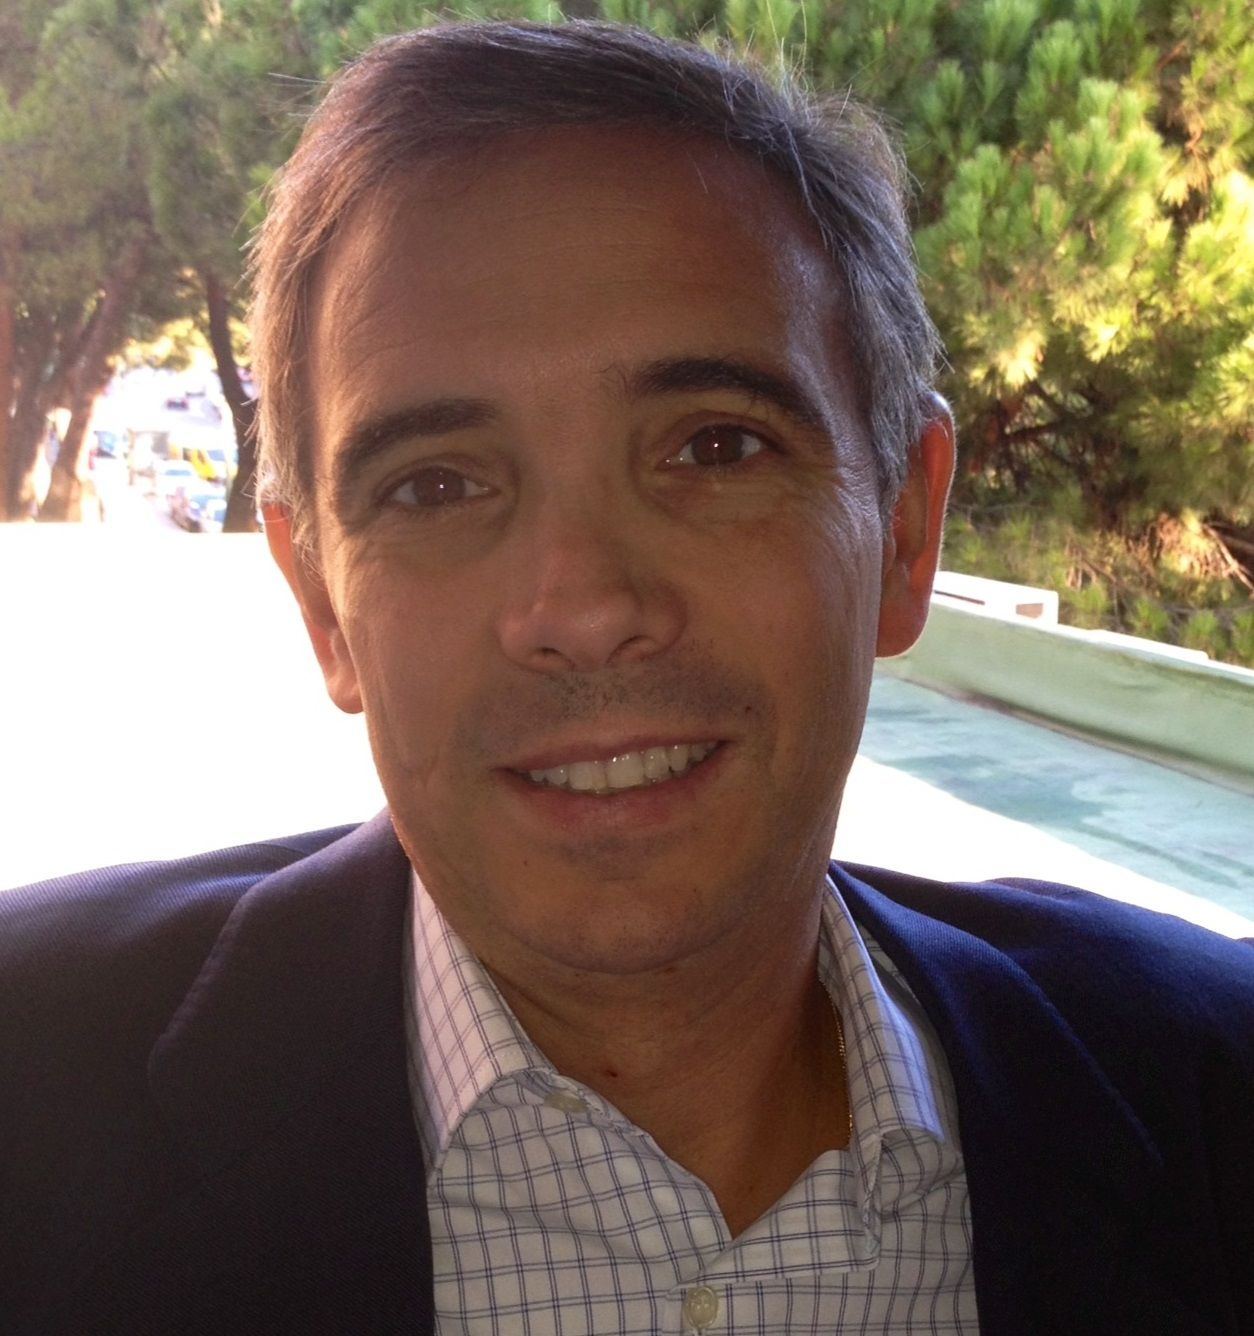 Antonio Fernandez Arimany has been announced as the new secretary general of the ITU ©ITU